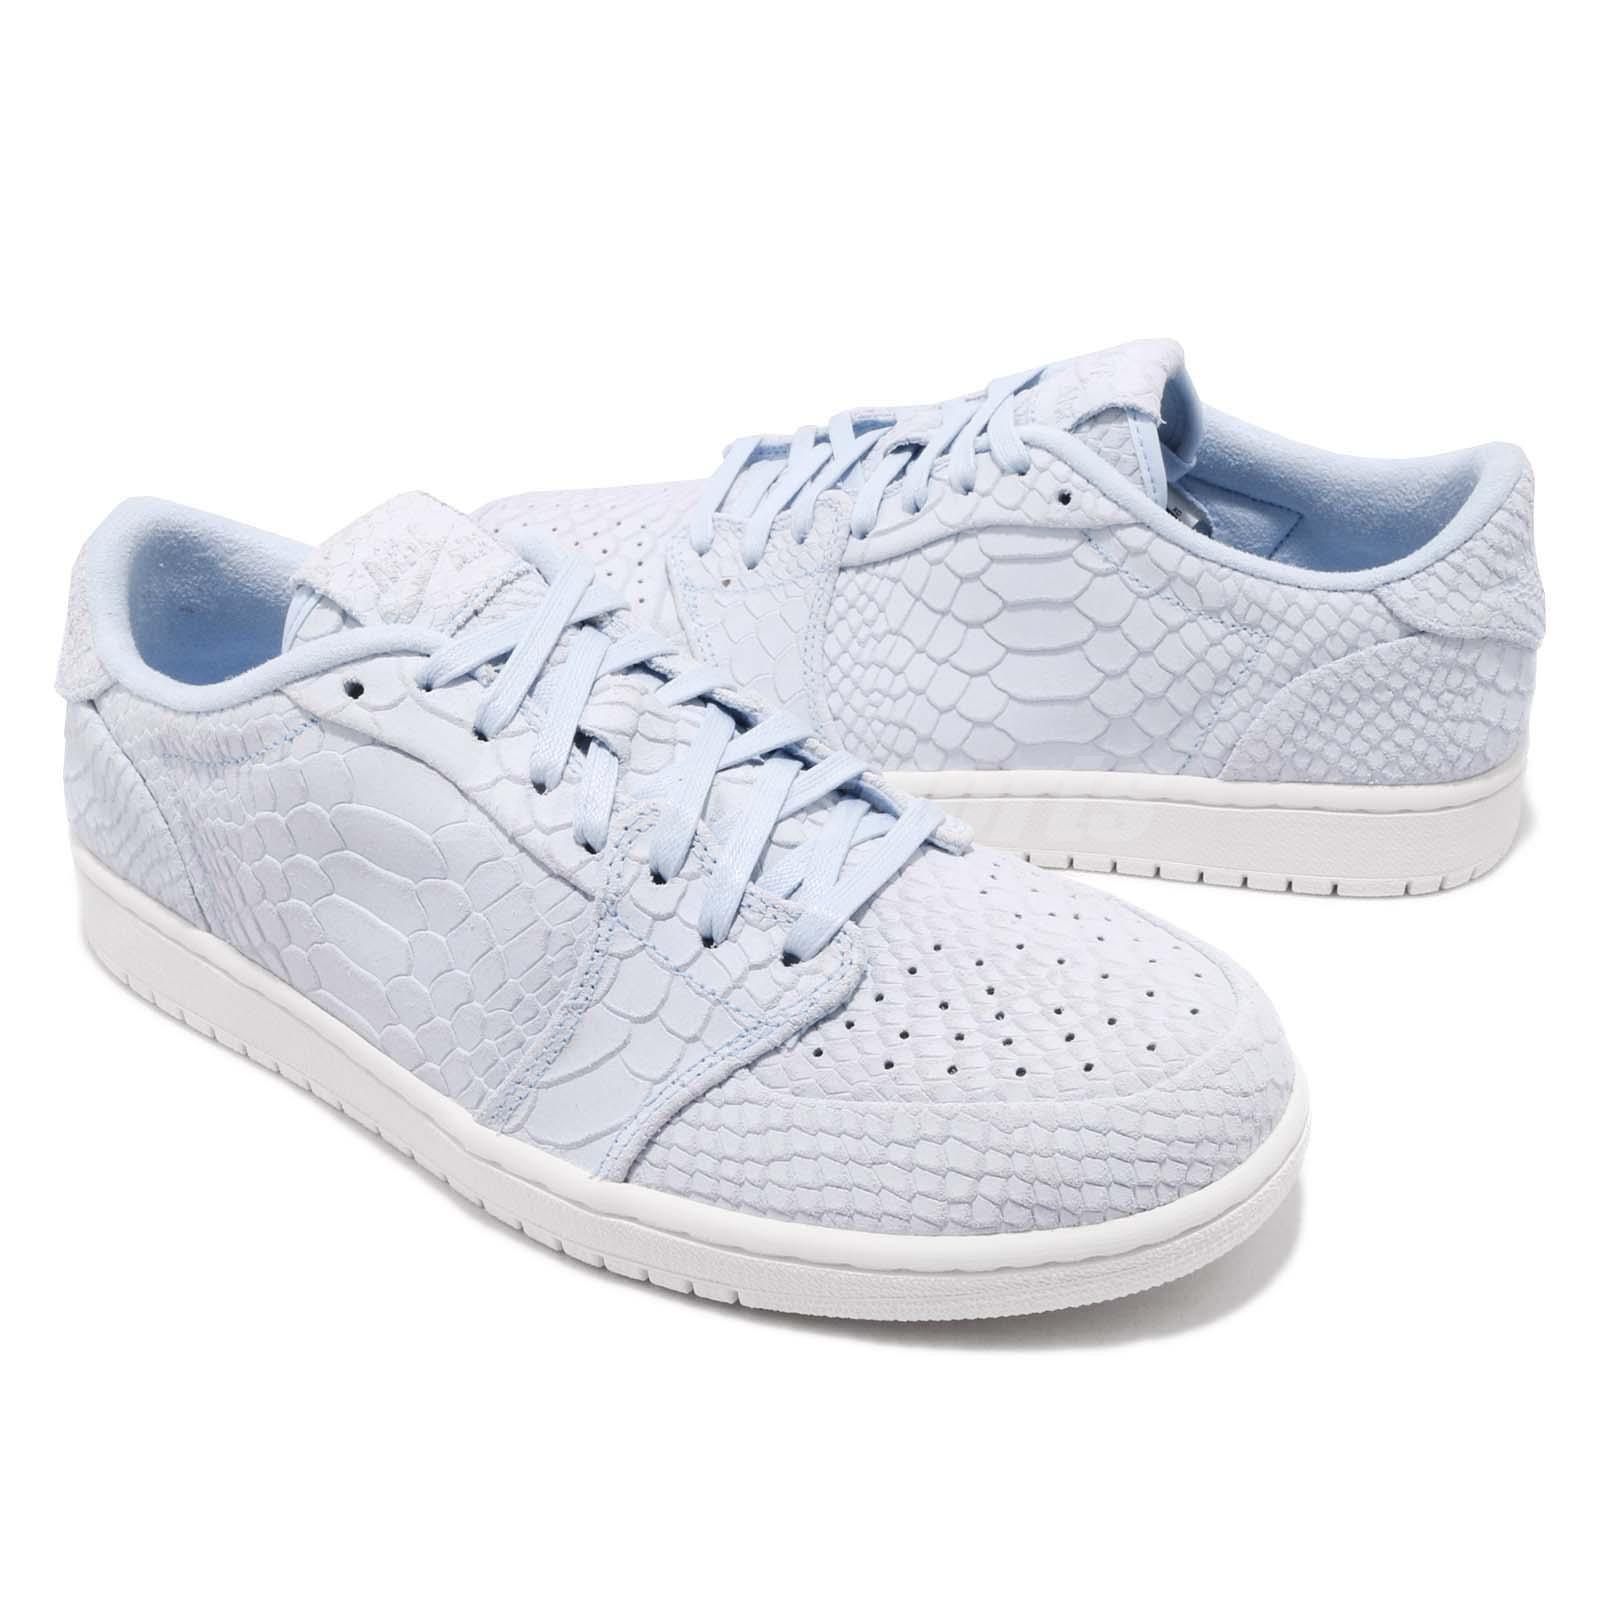 6fc07bc7620 Men's Shoes Nike Air Jordan 1 Retro Low NS No Swoosh Ice Blue Sail Men Shoes  ...